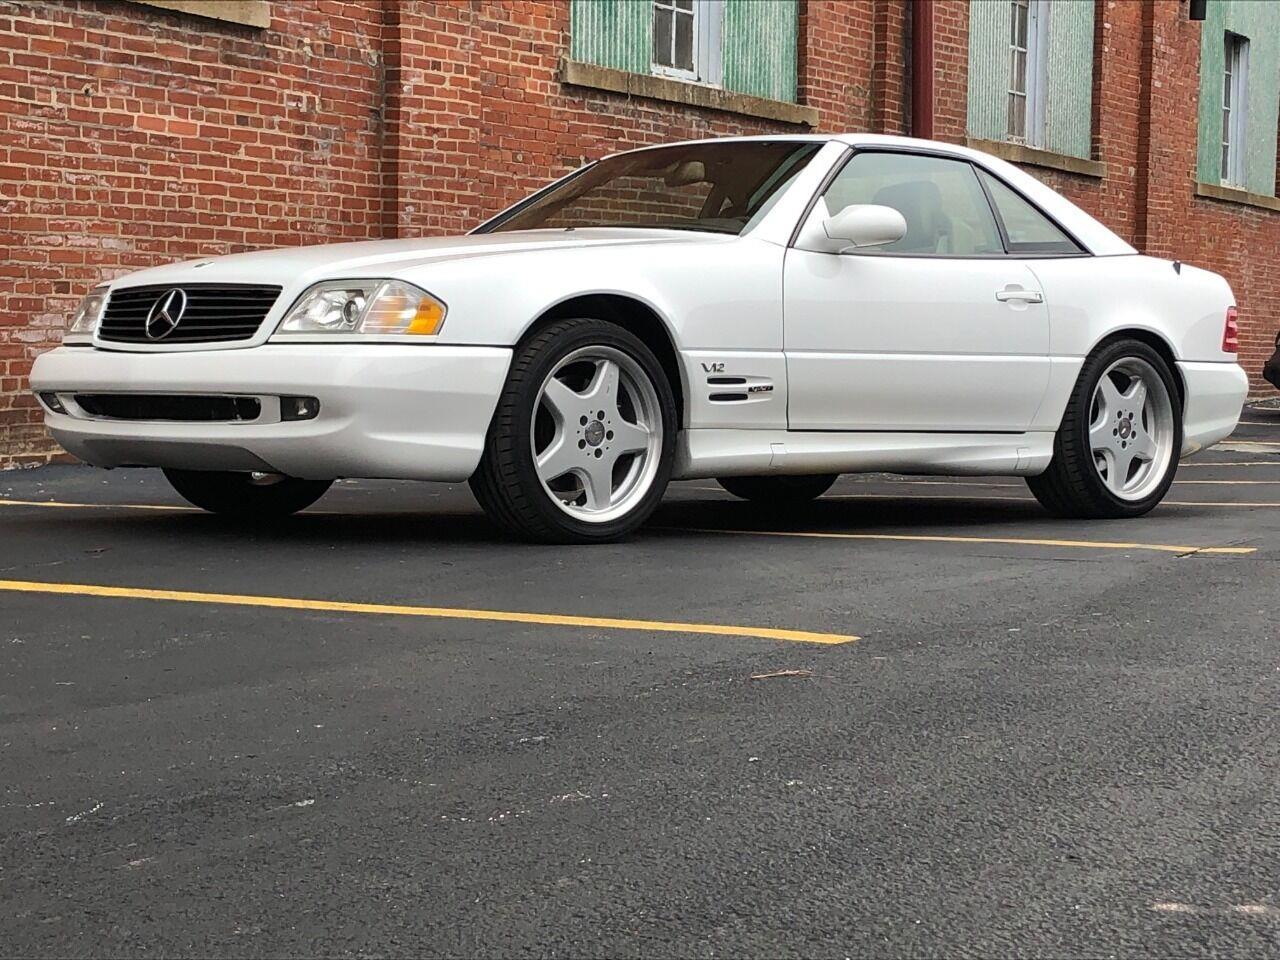 2000 Mercedes-Benz SL-Class (CC-1434644) for sale in Saint Charles, Missouri